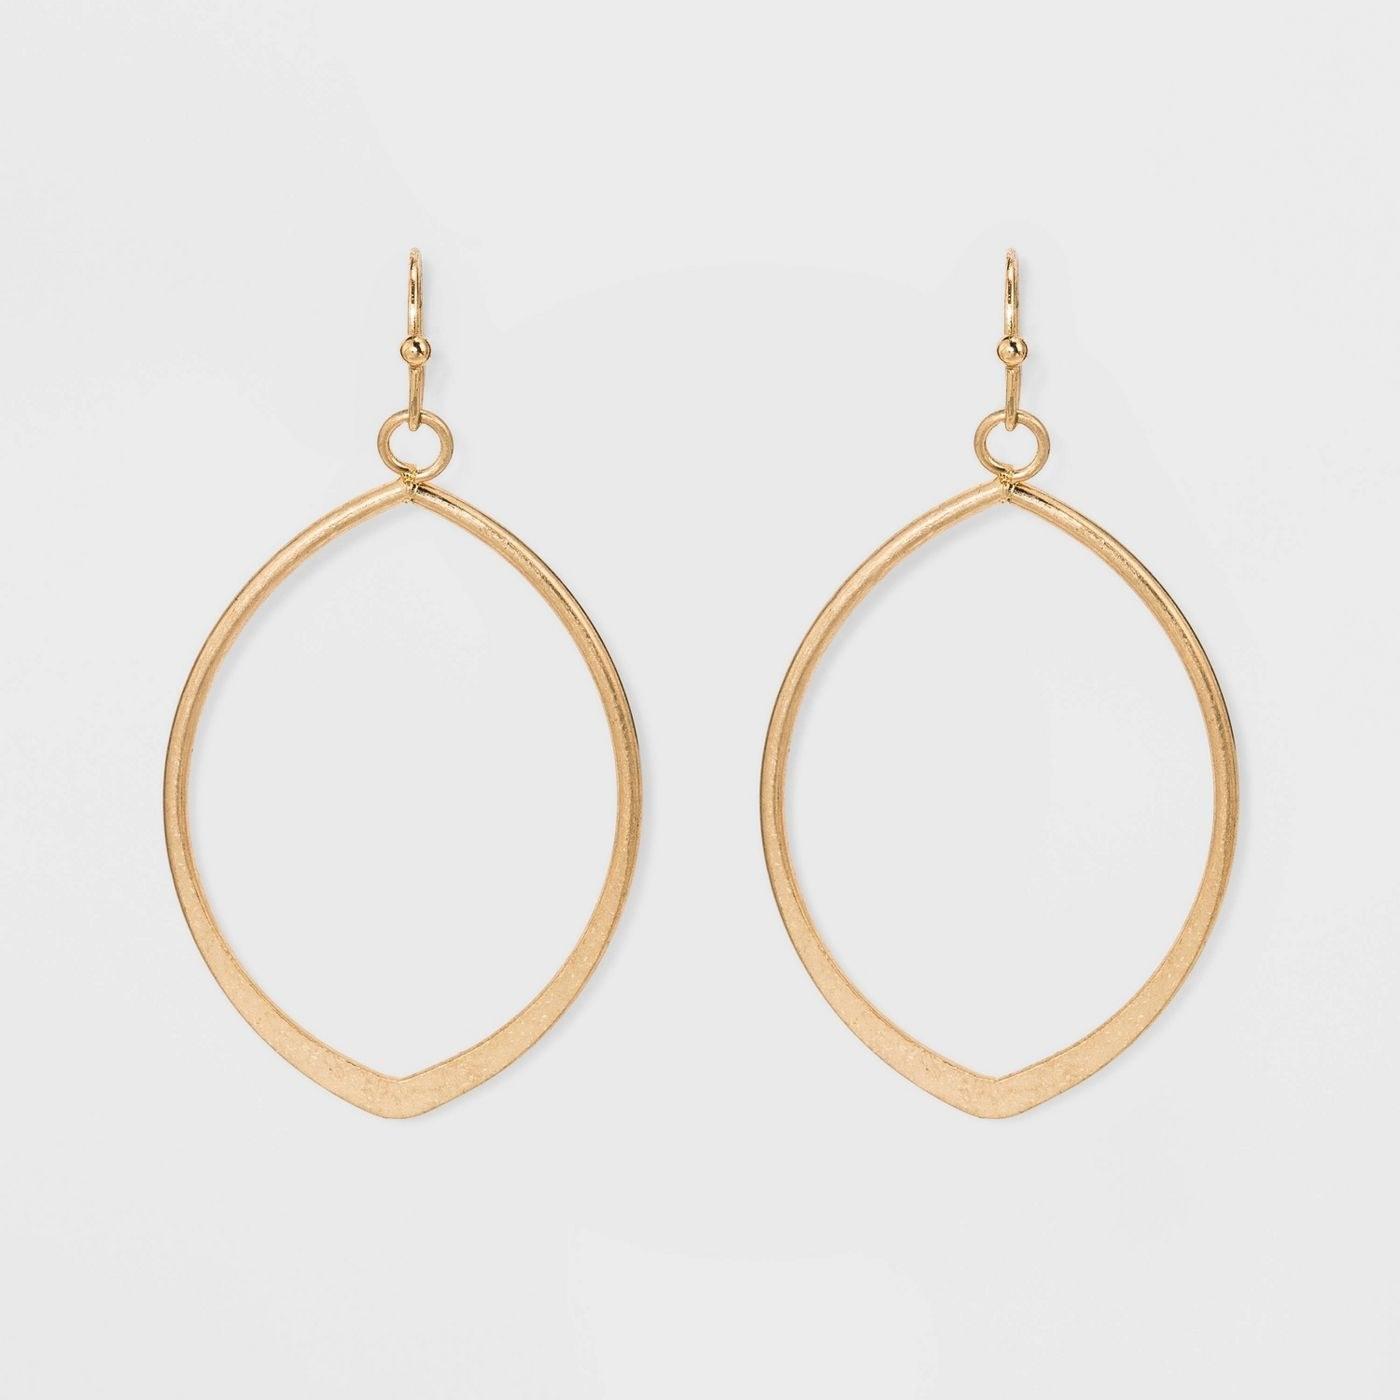 Circular, metal cut earrings with fish hook closure